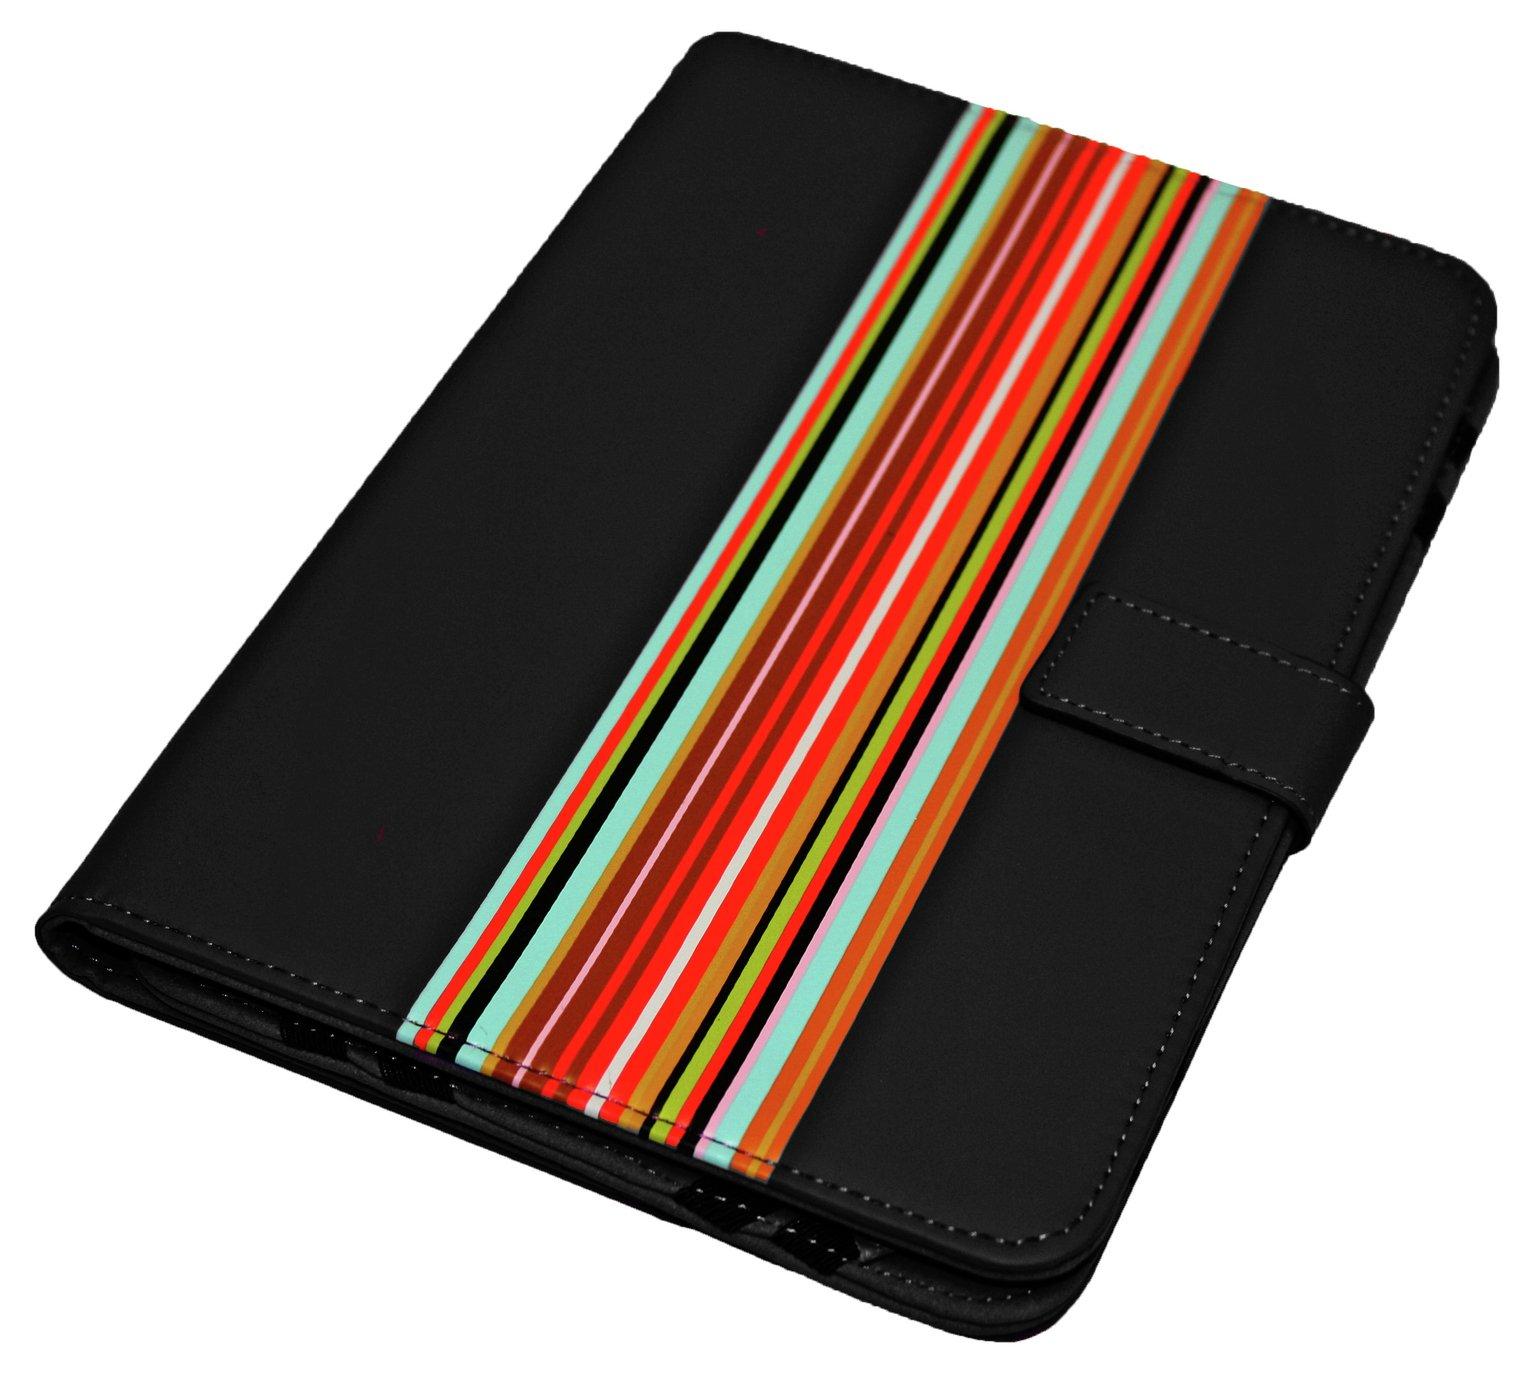 Universal - 9/10 Inch Striped PVC Tablet Case - Black